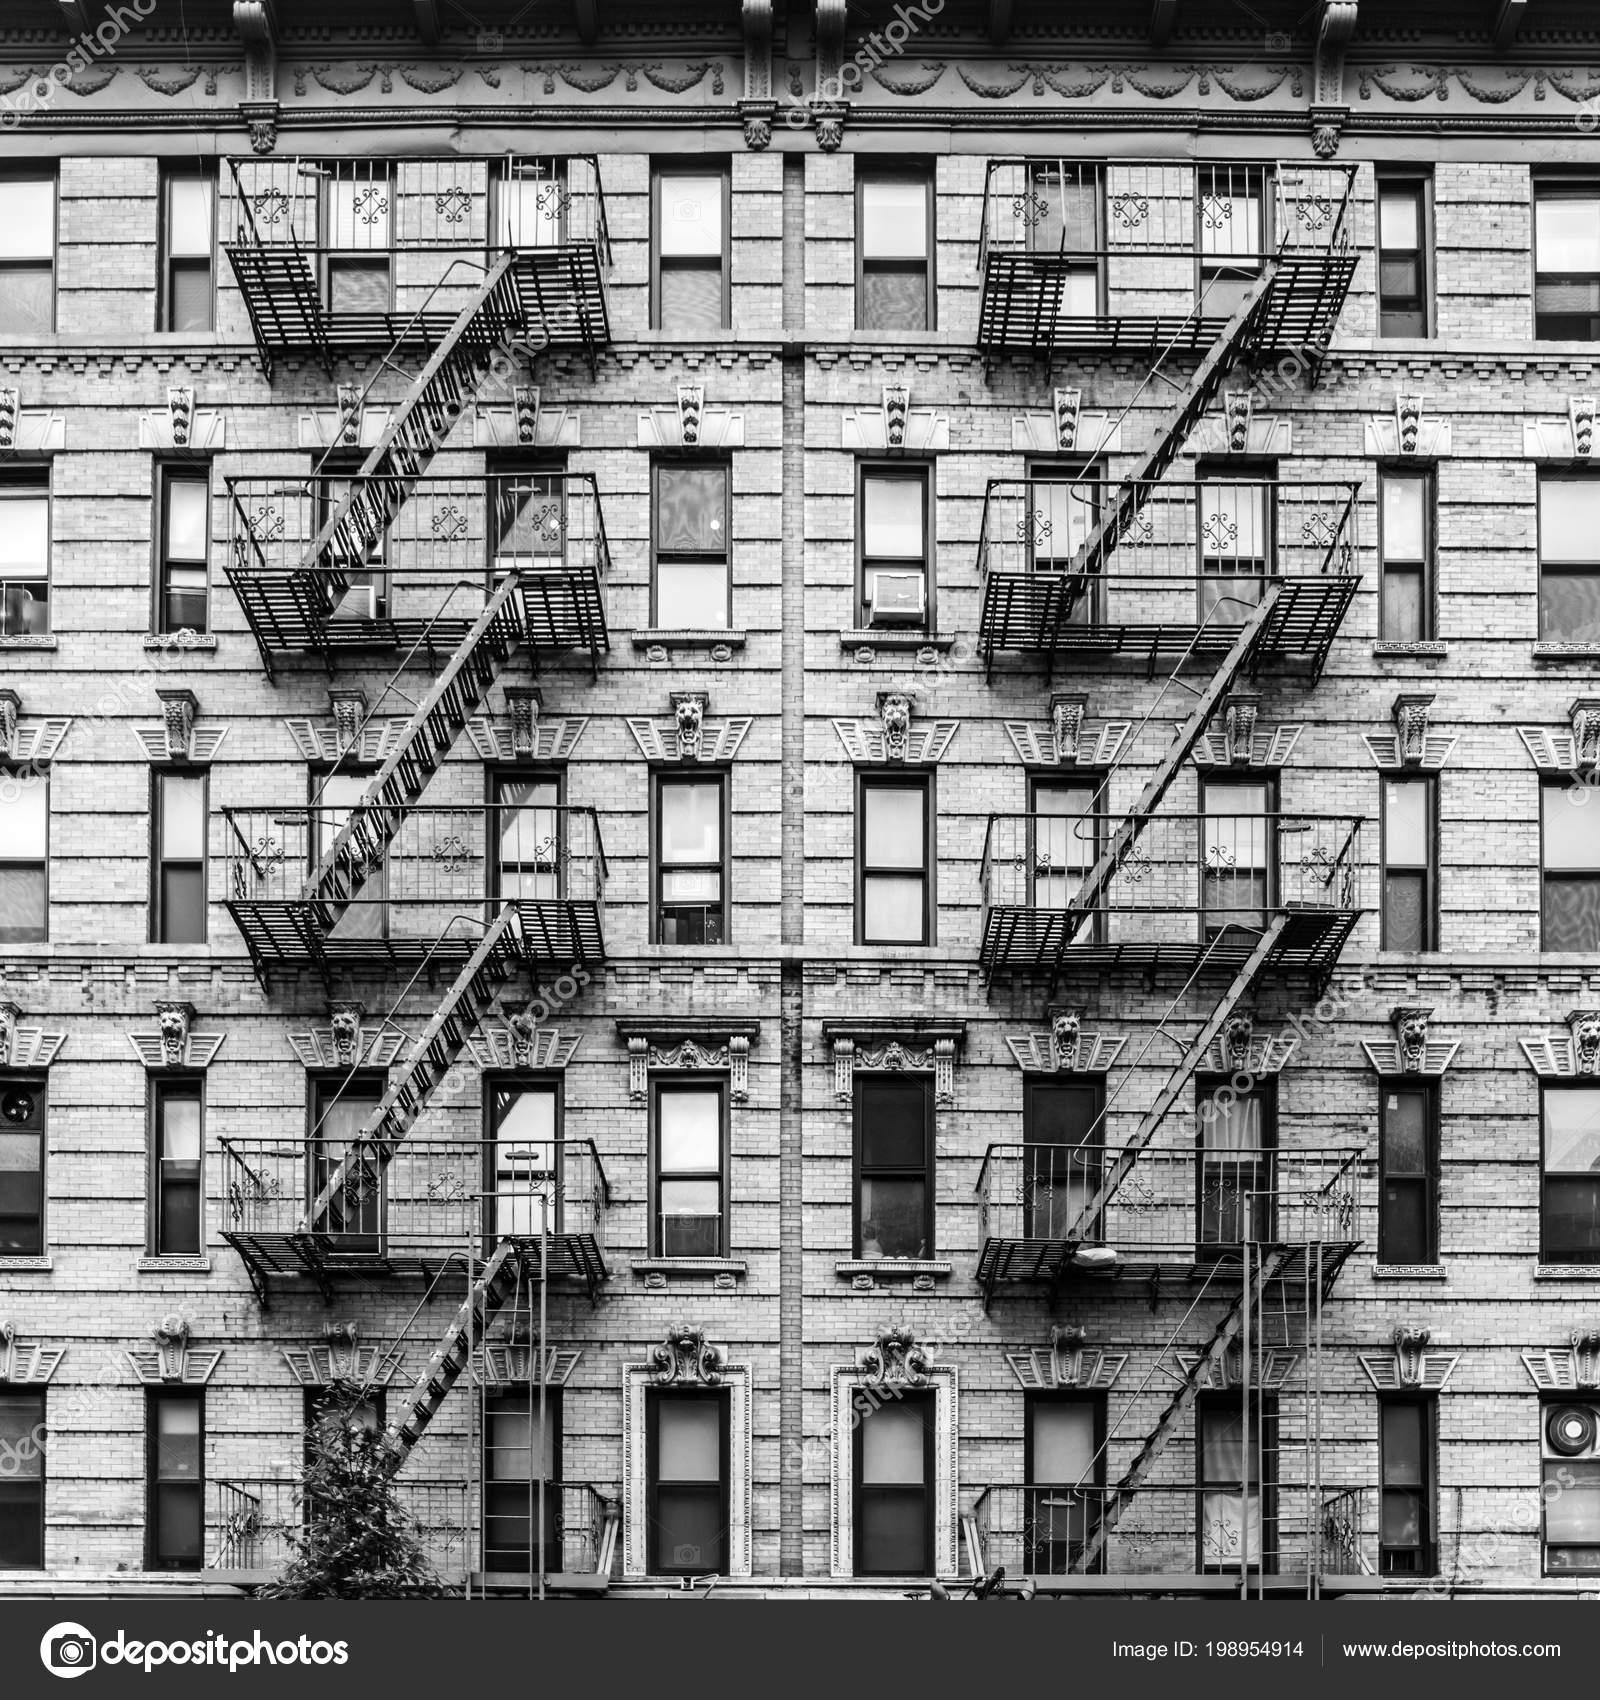 Apartment Building Manhattan New York: A Fire Escape Of An Apartment Building In New York City